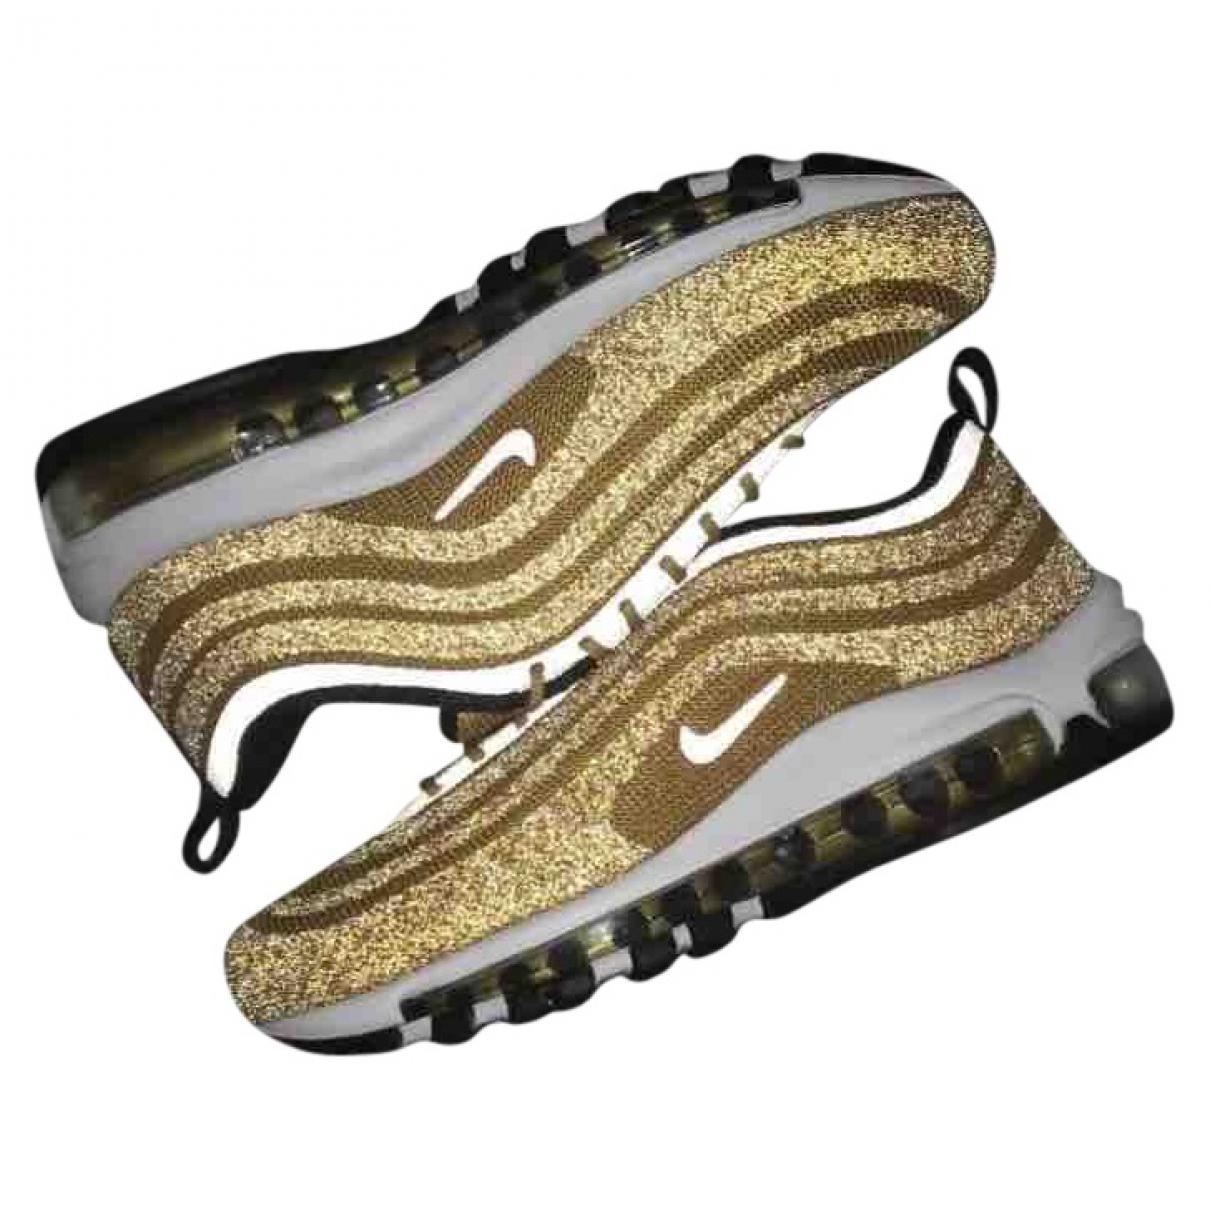 Nike Metallic Air Max 97 Gold Glitter Trainers